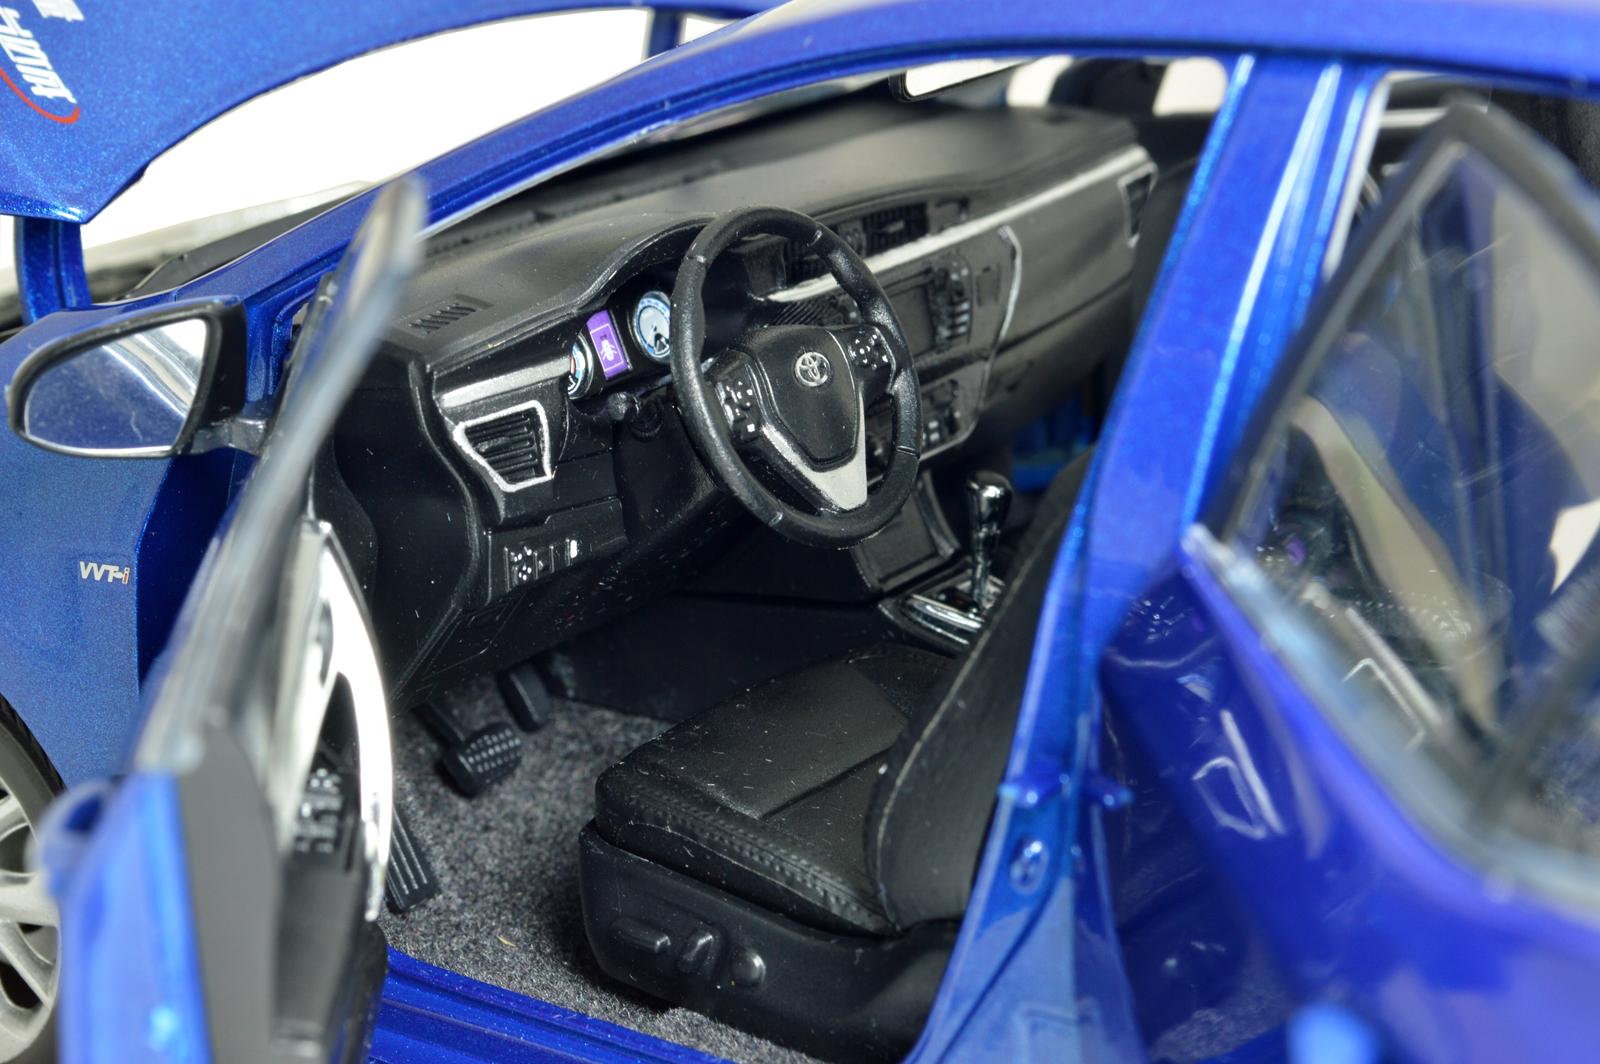 Toyota Corolla 2014 1/18 Scale Diecast Model Car Wholesale 9